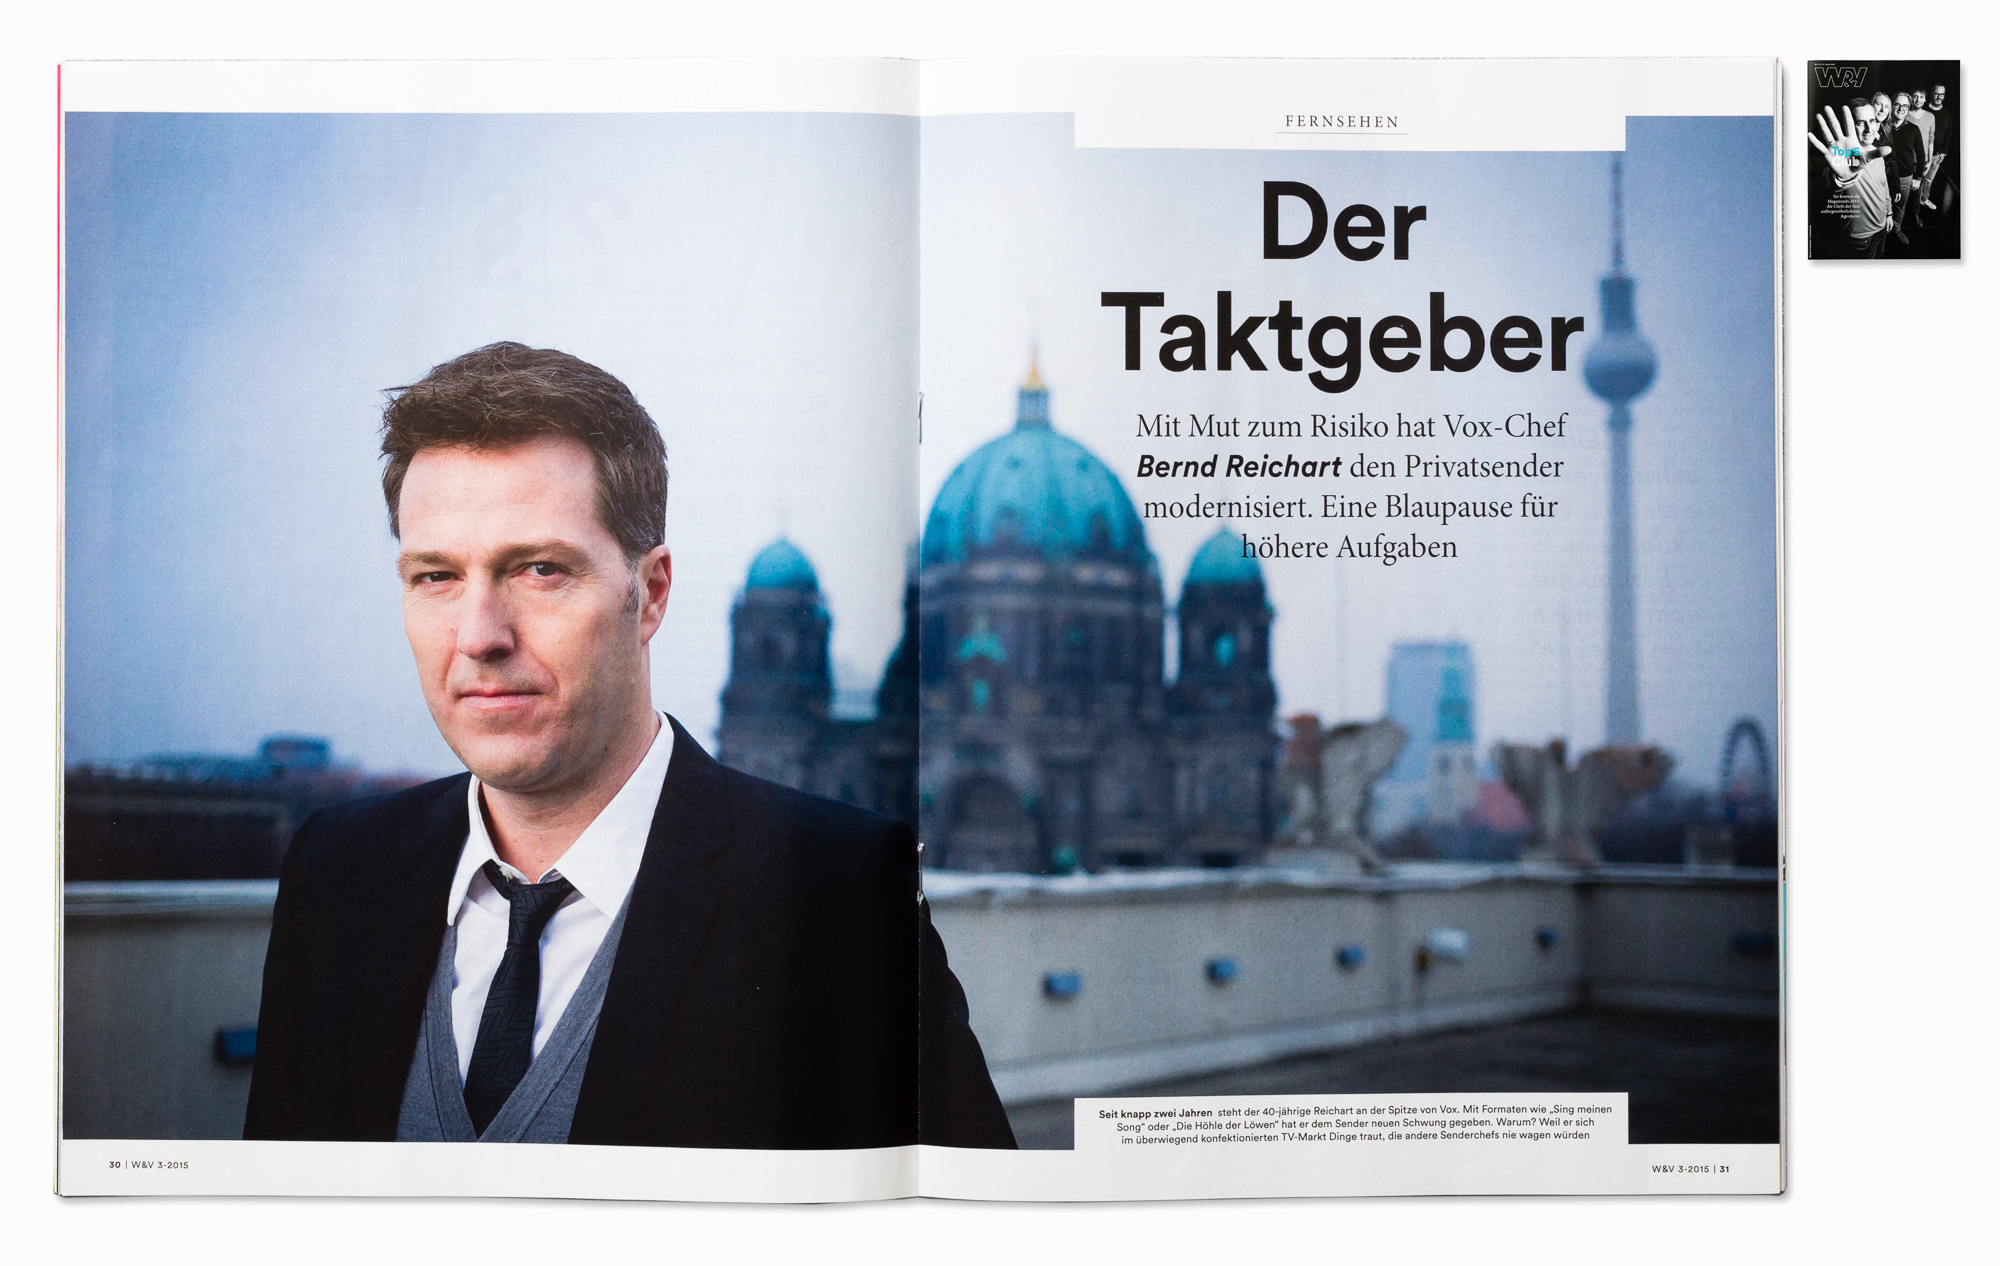 VOX TV Germany CEO Bernd Reichart for W&V Magazine, Berlin 2014